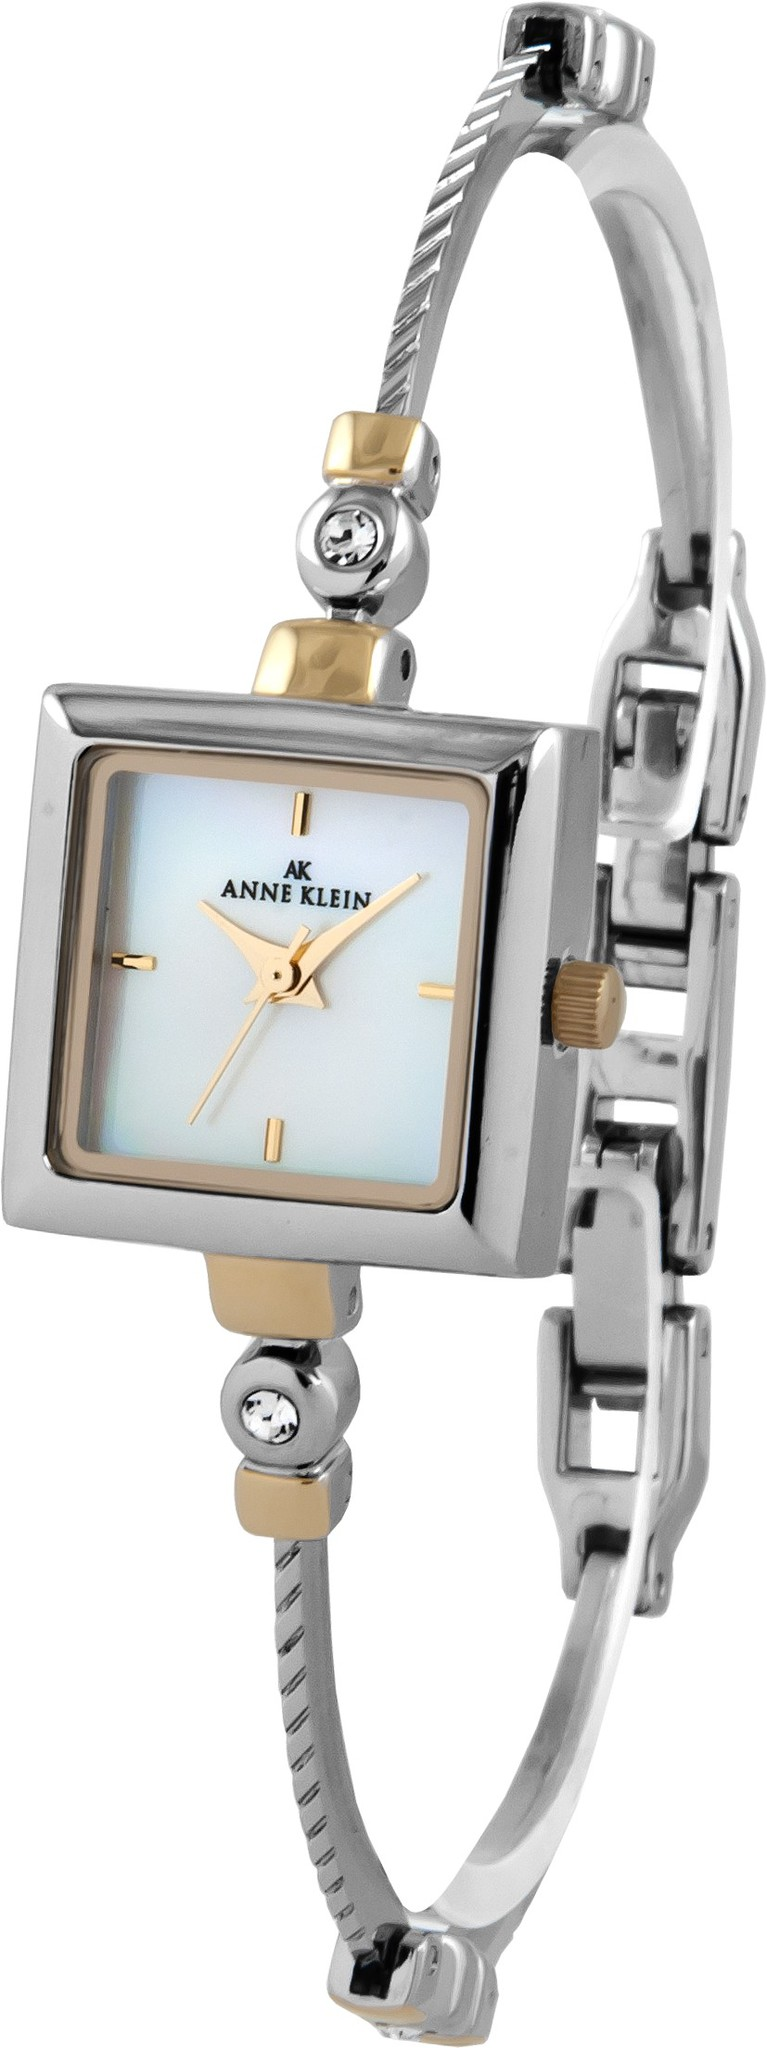 Anne Klein 9117MPTT - женские наручные часы из коллекции CrystalAnne Klein<br><br><br>Бренд: Anne Klein<br>Модель: Anne Klein 9117 MPTT<br>Артикул: 9117MPTT<br>Вариант артикула: None<br>Коллекция: Crystal<br>Подколлекция: None<br>Страна: США<br>Пол: женские<br>Тип механизма: кварцевые<br>Механизм: None<br>Количество камней: None<br>Автоподзавод: None<br>Источник энергии: от батарейки<br>Срок службы элемента питания: None<br>Дисплей: стрелки<br>Цифры: отсутствуют<br>Водозащита: WR 30<br>Противоударные: None<br>Материал корпуса: нерж. сталь, покрытие: позолота (частичное)<br>Материал браслета: не указан, покрытие: позолота (частичное)<br>Материал безеля: None<br>Стекло: минеральное<br>Антибликовое покрытие: None<br>Цвет корпуса: None<br>Цвет браслета: None<br>Цвет циферблата: None<br>Цвет безеля: None<br>Размеры: None<br>Диаметр: None<br>Диаметр корпуса: None<br>Толщина: None<br>Ширина ремешка: None<br>Вес: None<br>Спорт-функции: None<br>Подсветка: None<br>Вставка: кристаллы Swarovski<br>Отображение даты: None<br>Хронограф: None<br>Таймер: None<br>Термометр: None<br>Хронометр: None<br>GPS: None<br>Радиосинхронизация: None<br>Барометр: None<br>Скелетон: None<br>Дополнительная информация: None<br>Дополнительные функции: None